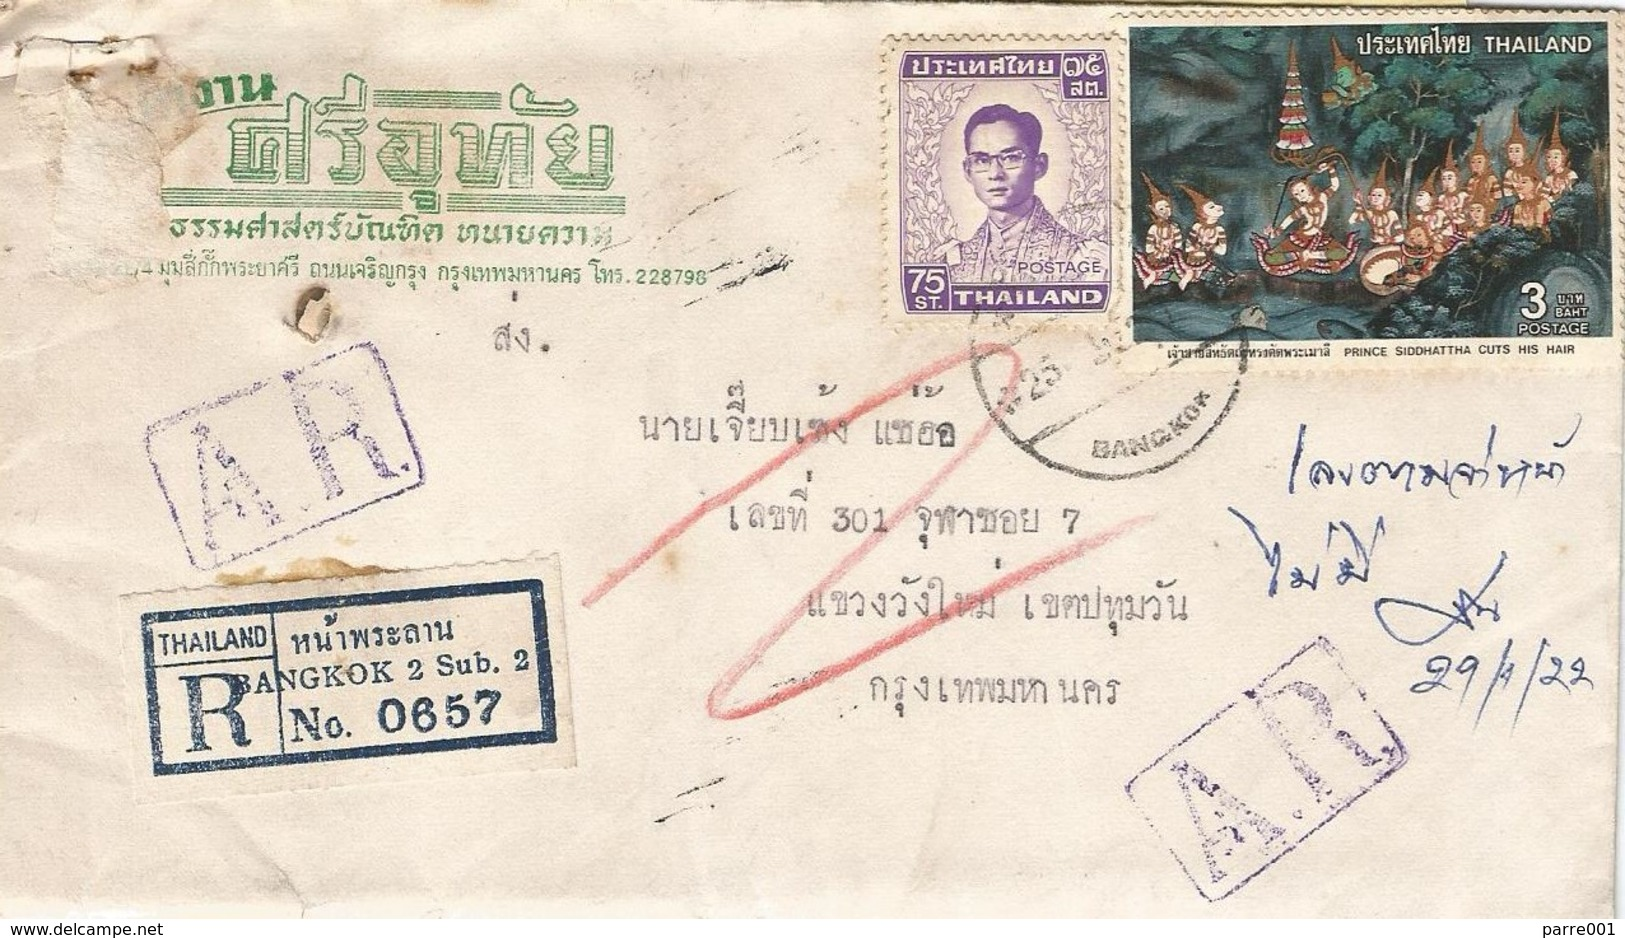 Thailand 1978 Bangkok 2 Buddhism Cutting Hair Registered AR Advice Of Receipt Returned Domestic Cover - Buddismo